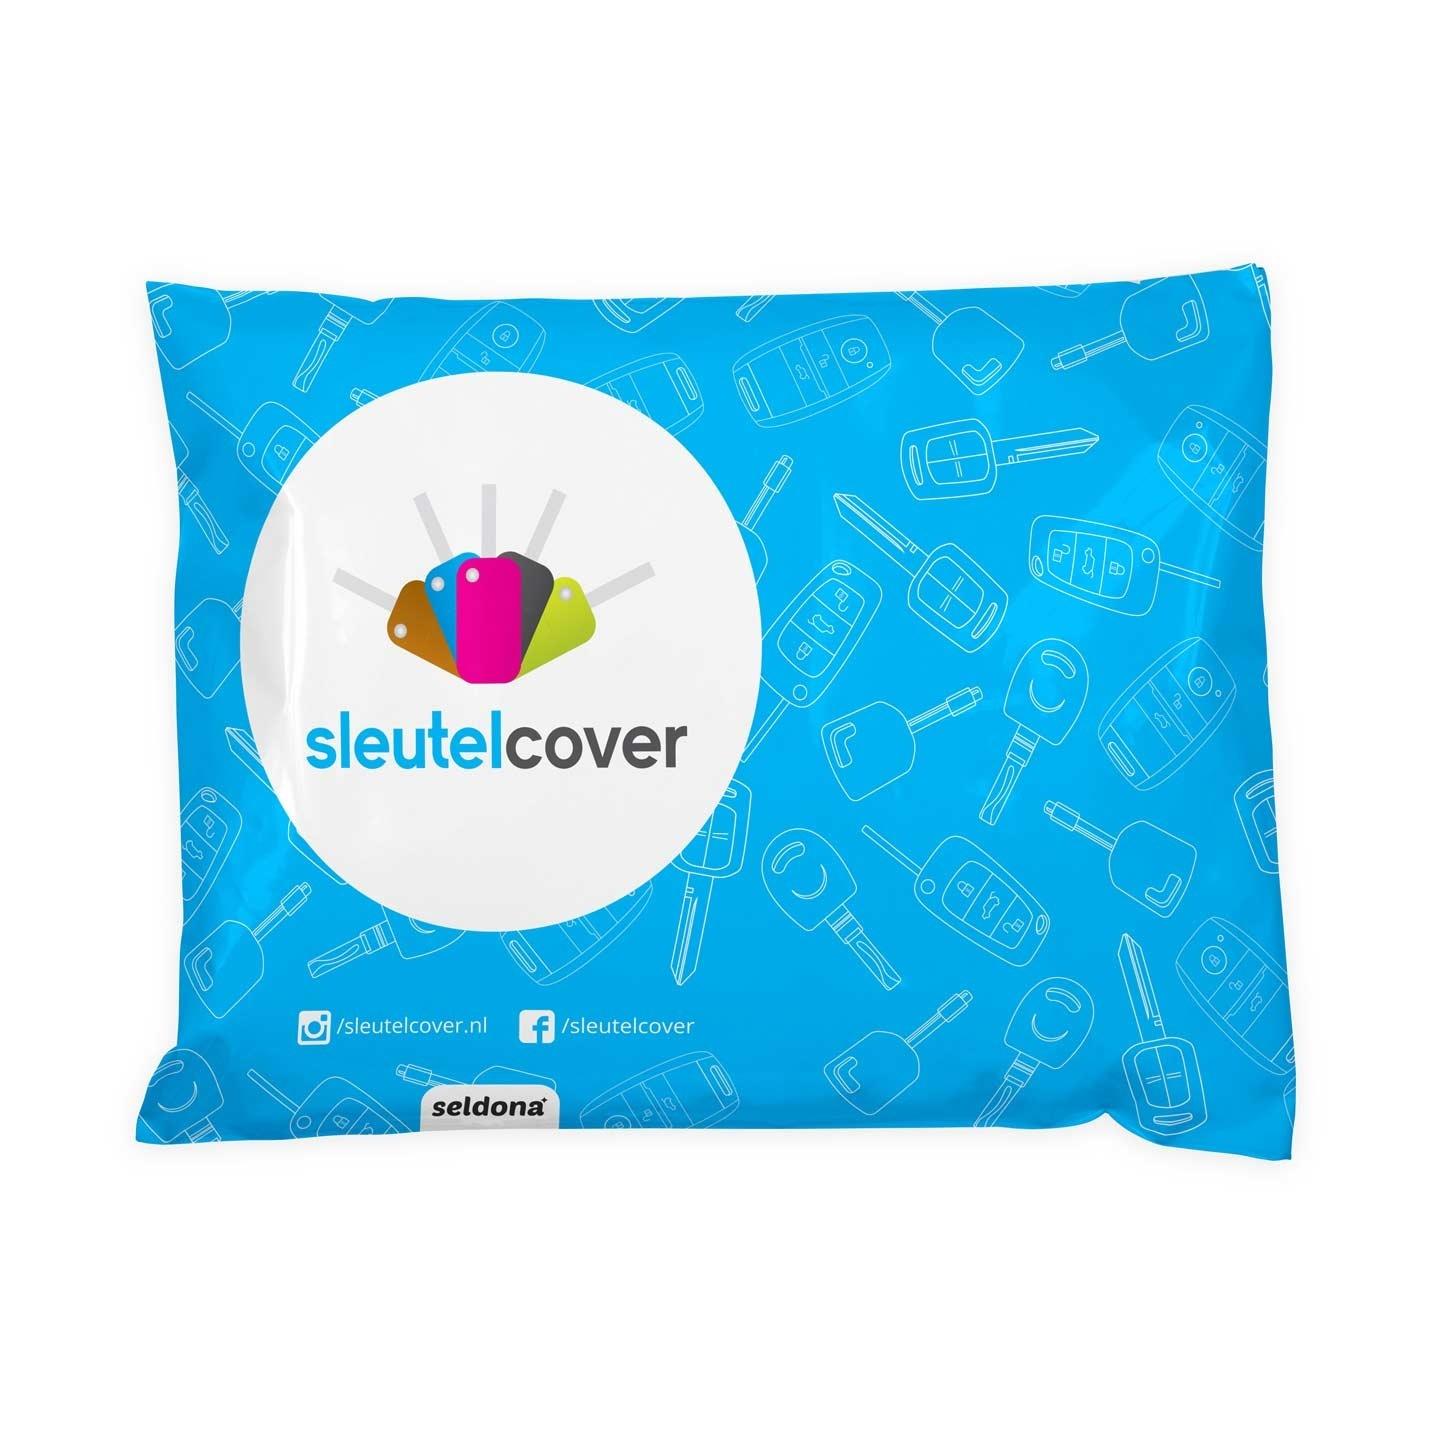 SleutelCover - Rood / Silicone sleutelhoesje / beschermhoesje autosleutel